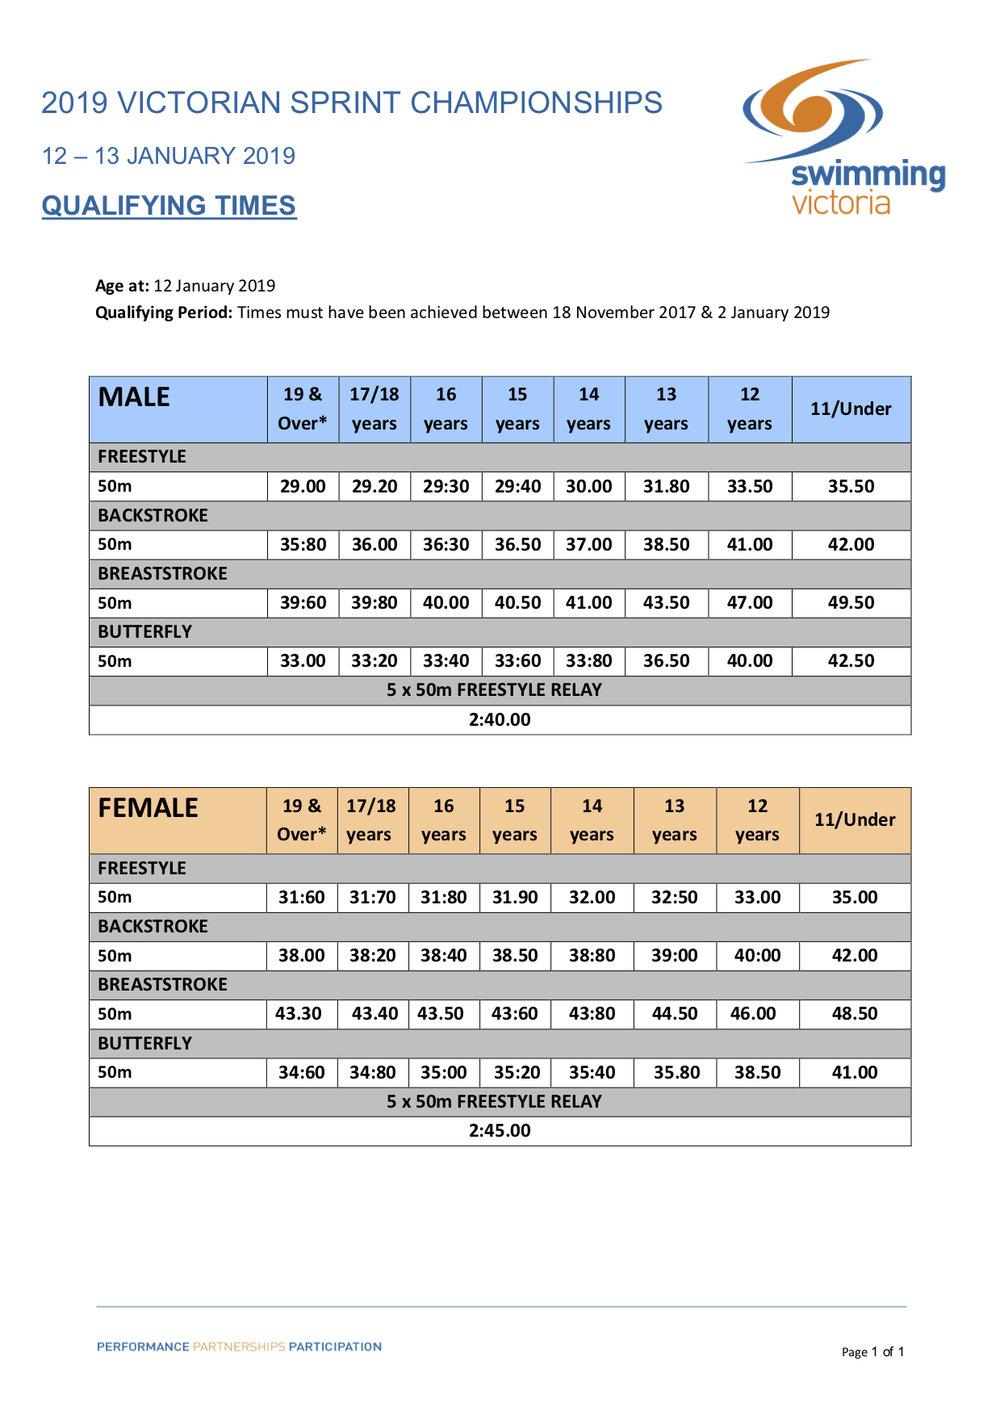 2019 Vic Sprint Championships Qualifying Times v1.jpg